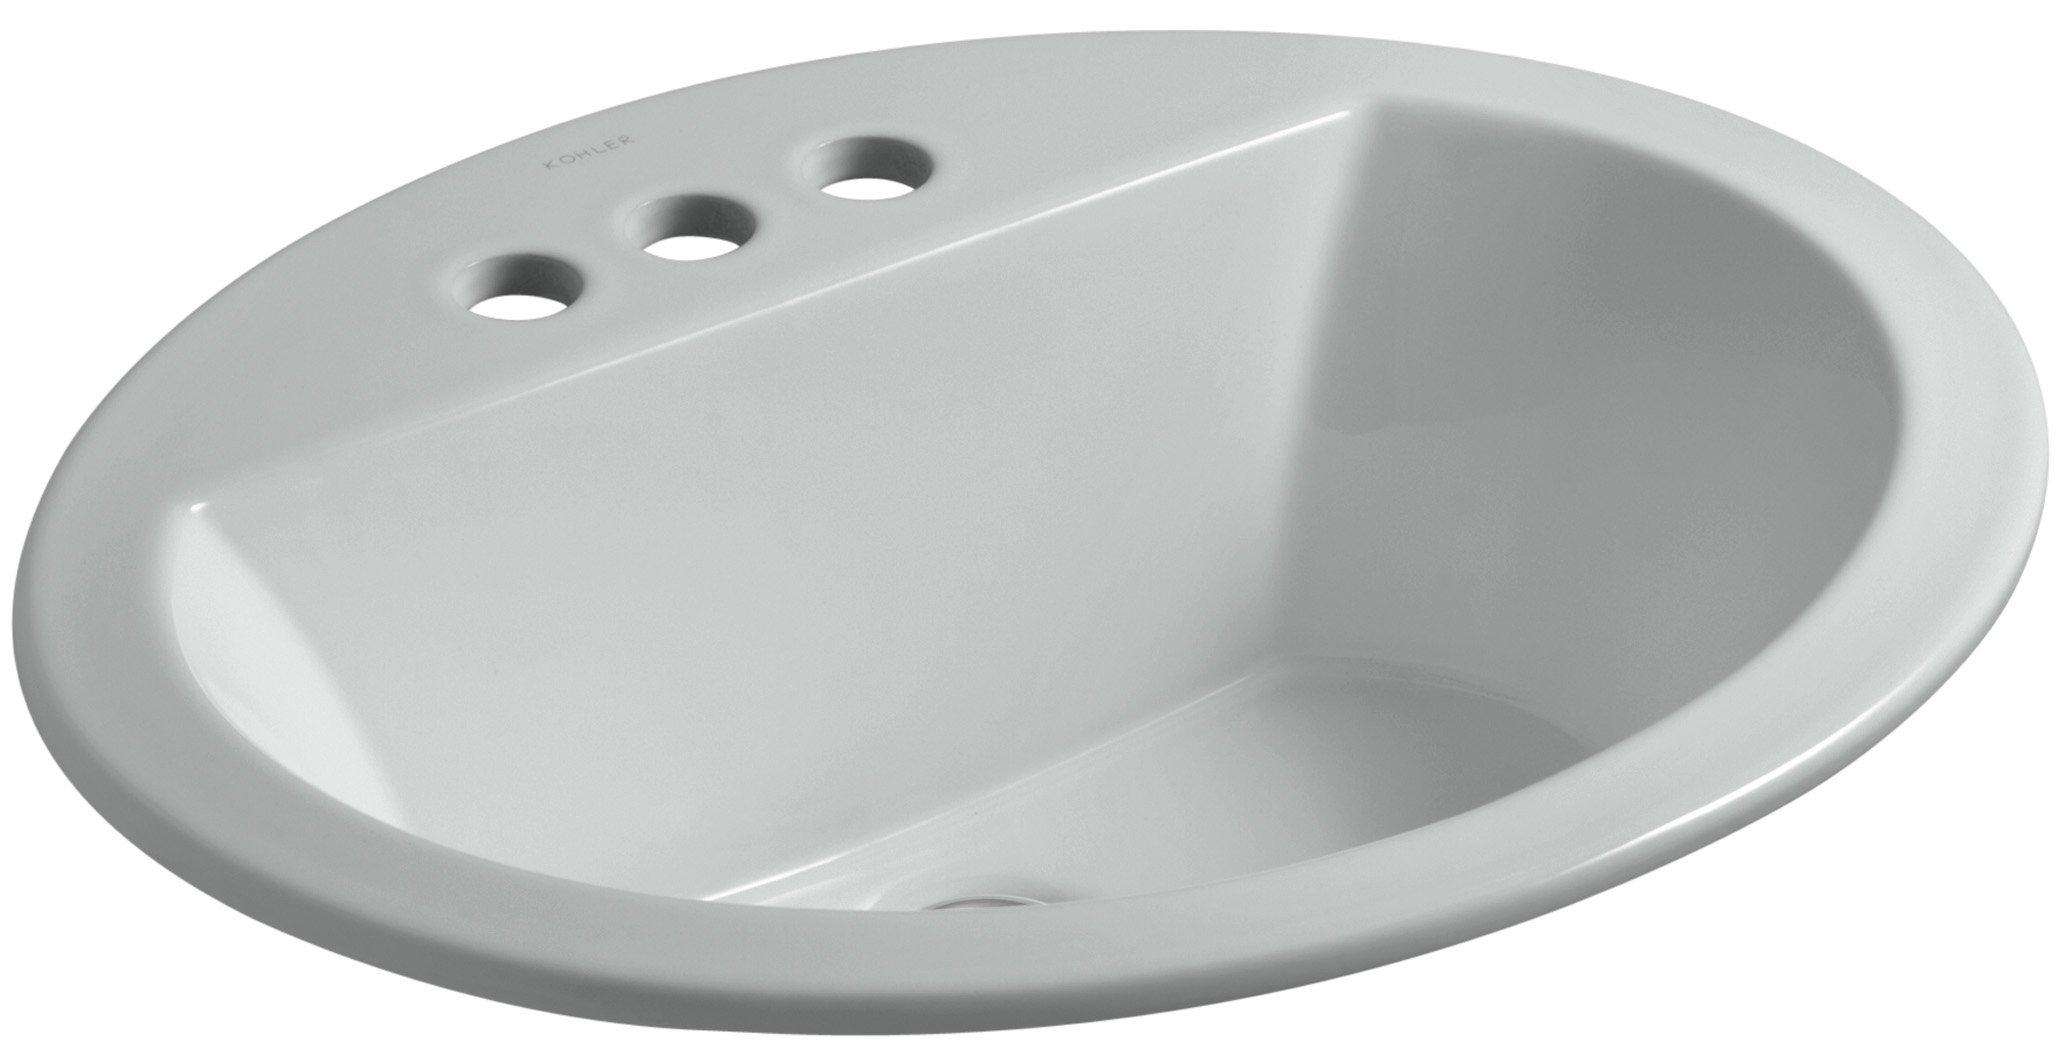 KOHLER K-2699-4-95 Bryant Oval Self-Rimming Bathroom Sink with 4'' Centers, Ice Grey